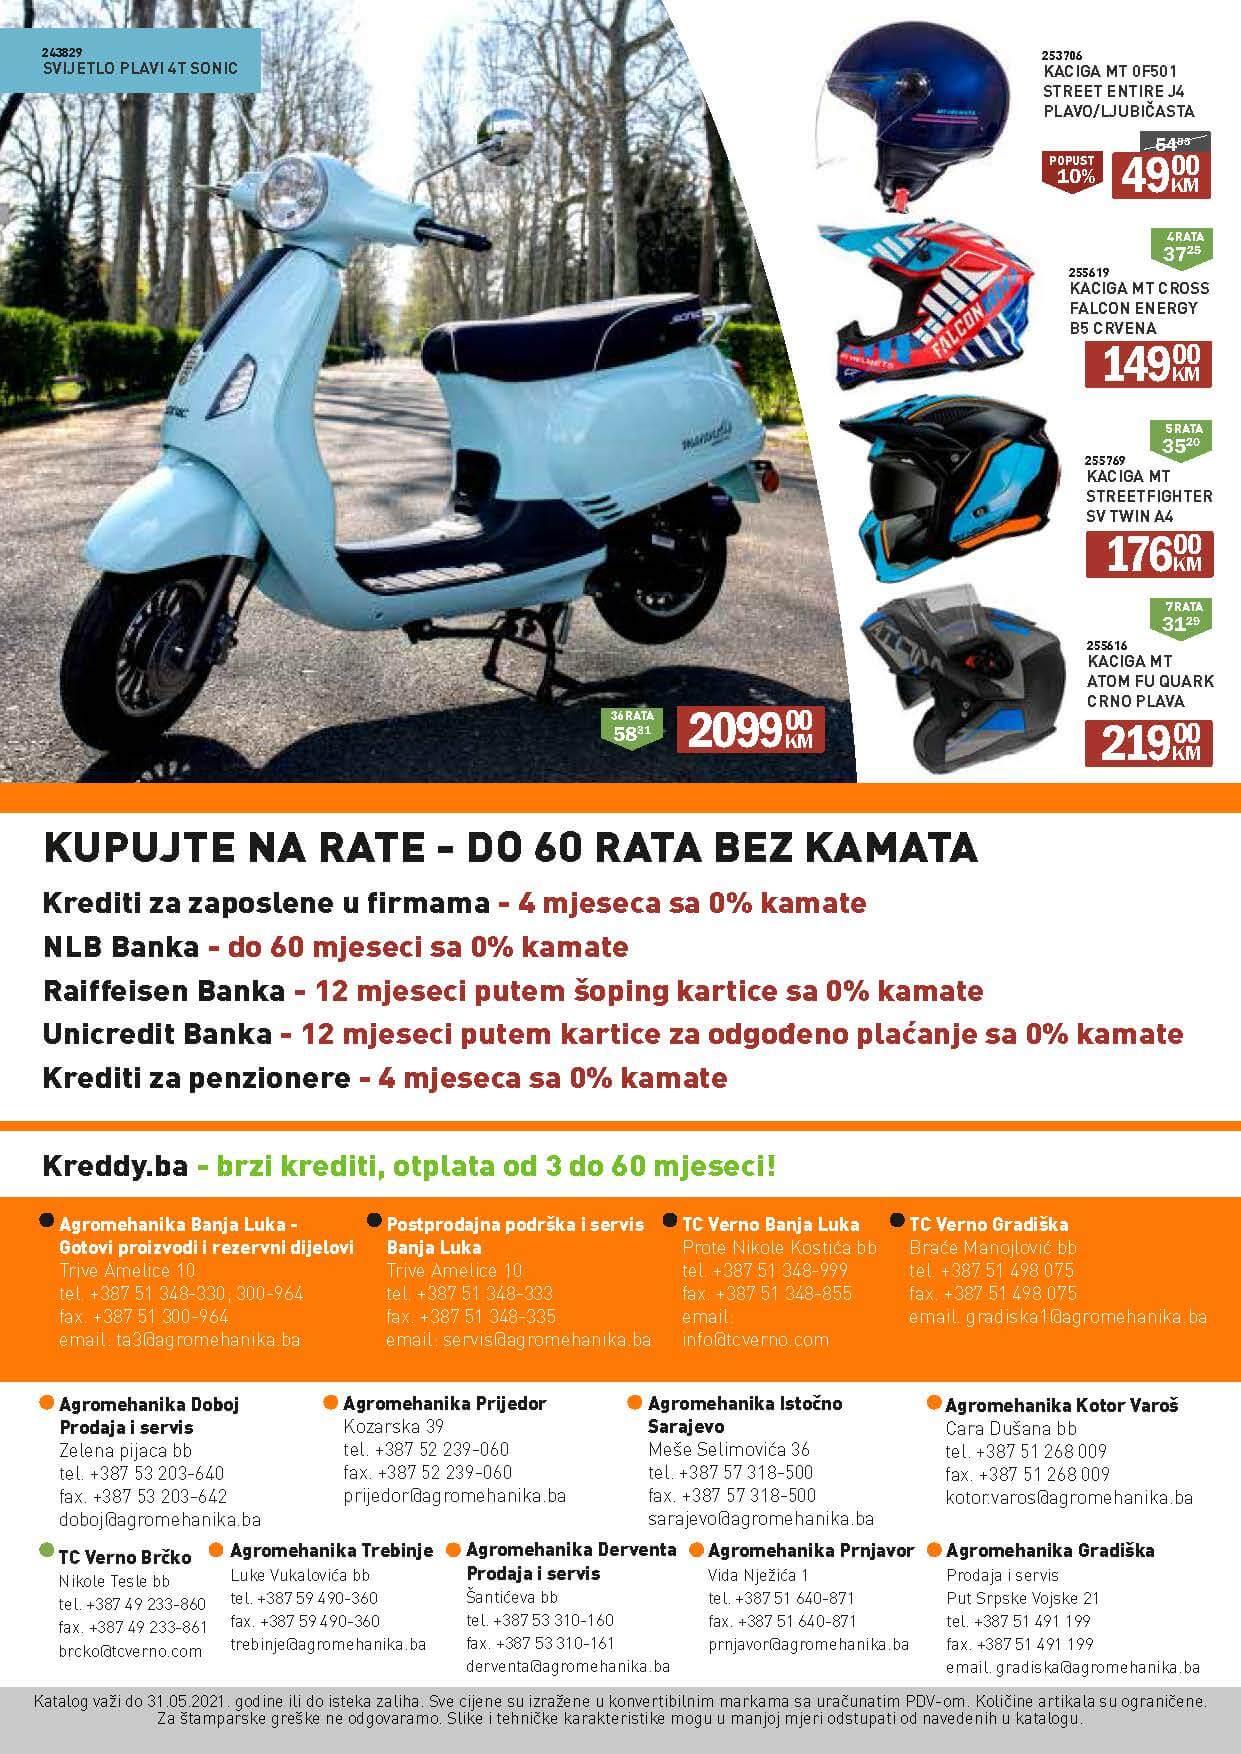 Maj 2021 Agromehanika Verno katalog 01.05.2021. 31.05.2021. Page 24